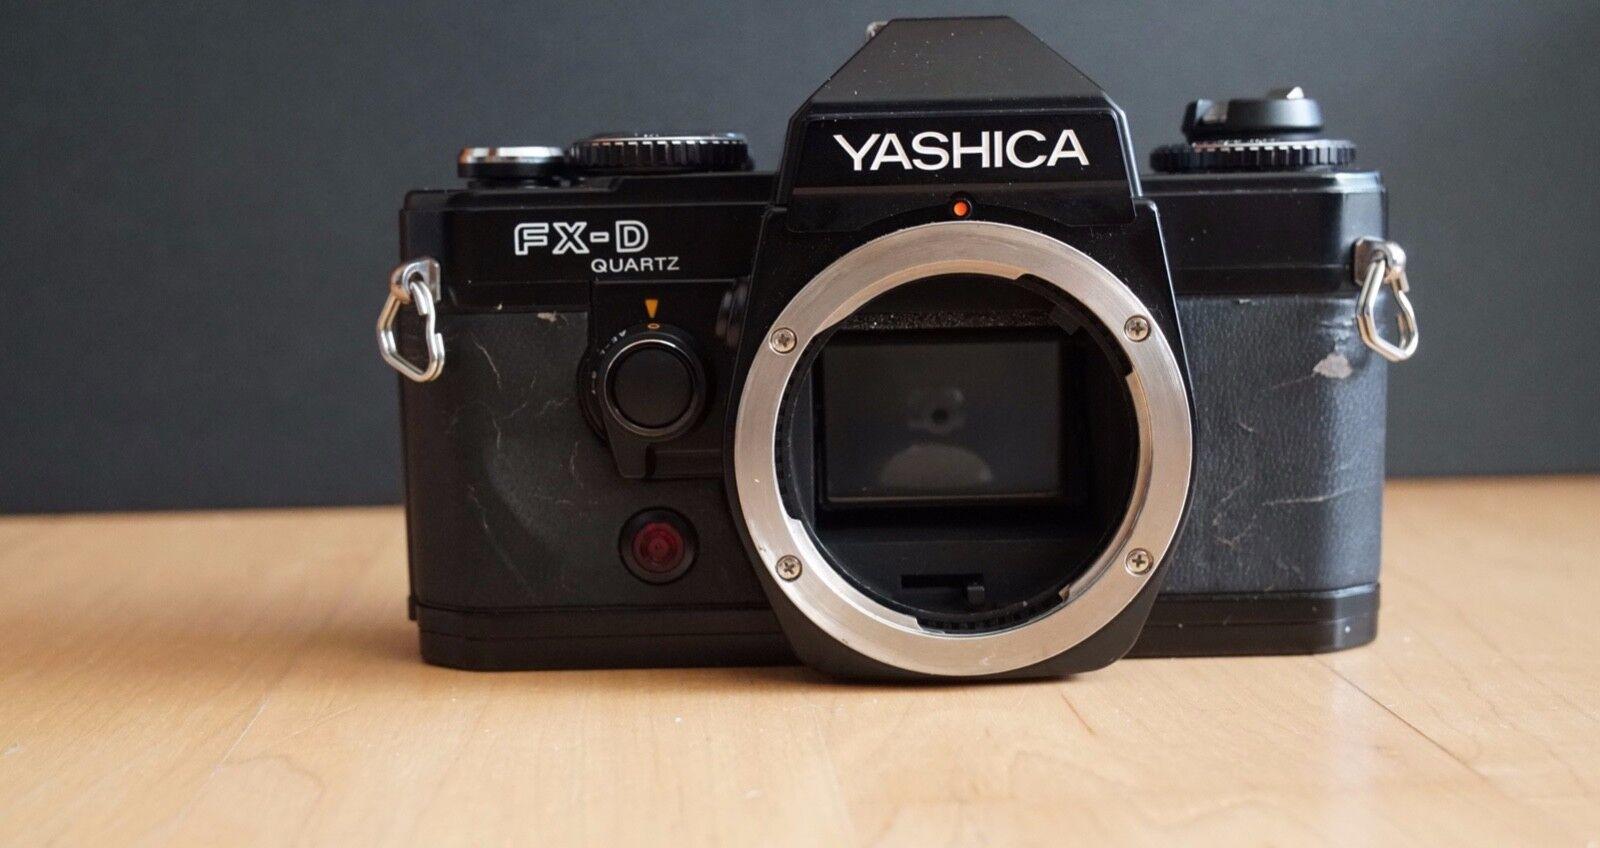 Set Yashica FX-D Quartz Spiegelreflexkamera mit 50mm f 2 Objektiv + Kamera Case